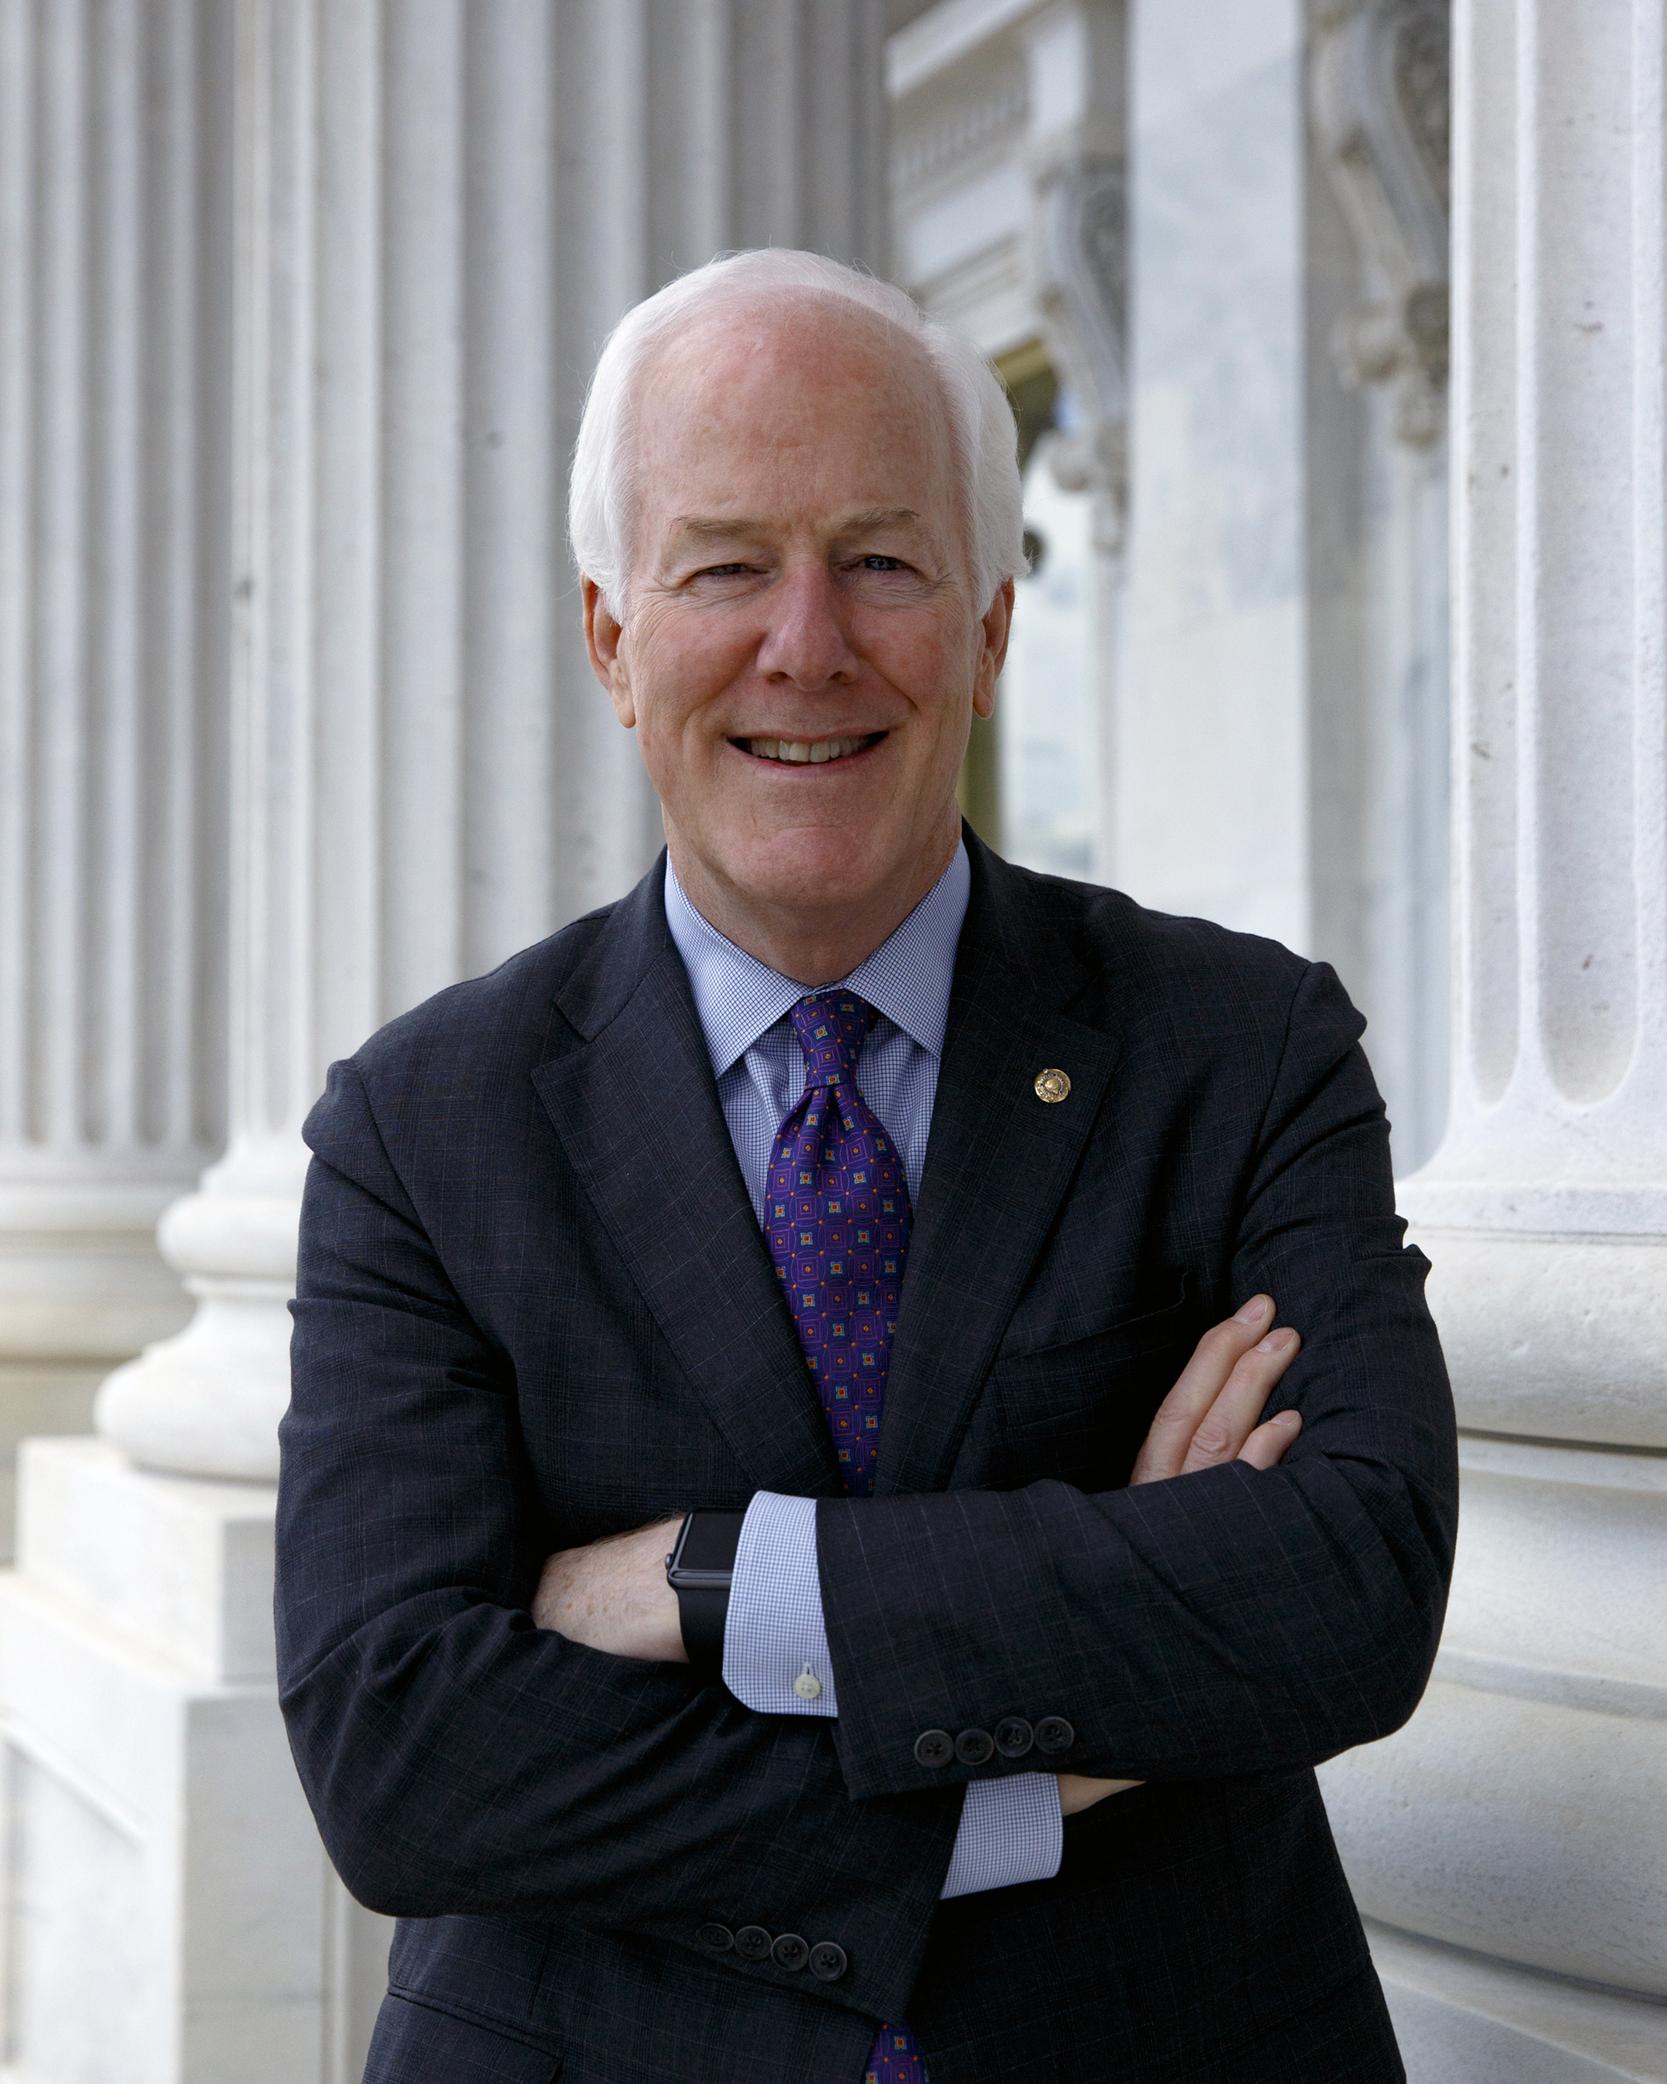 United States Senator John Cornyn